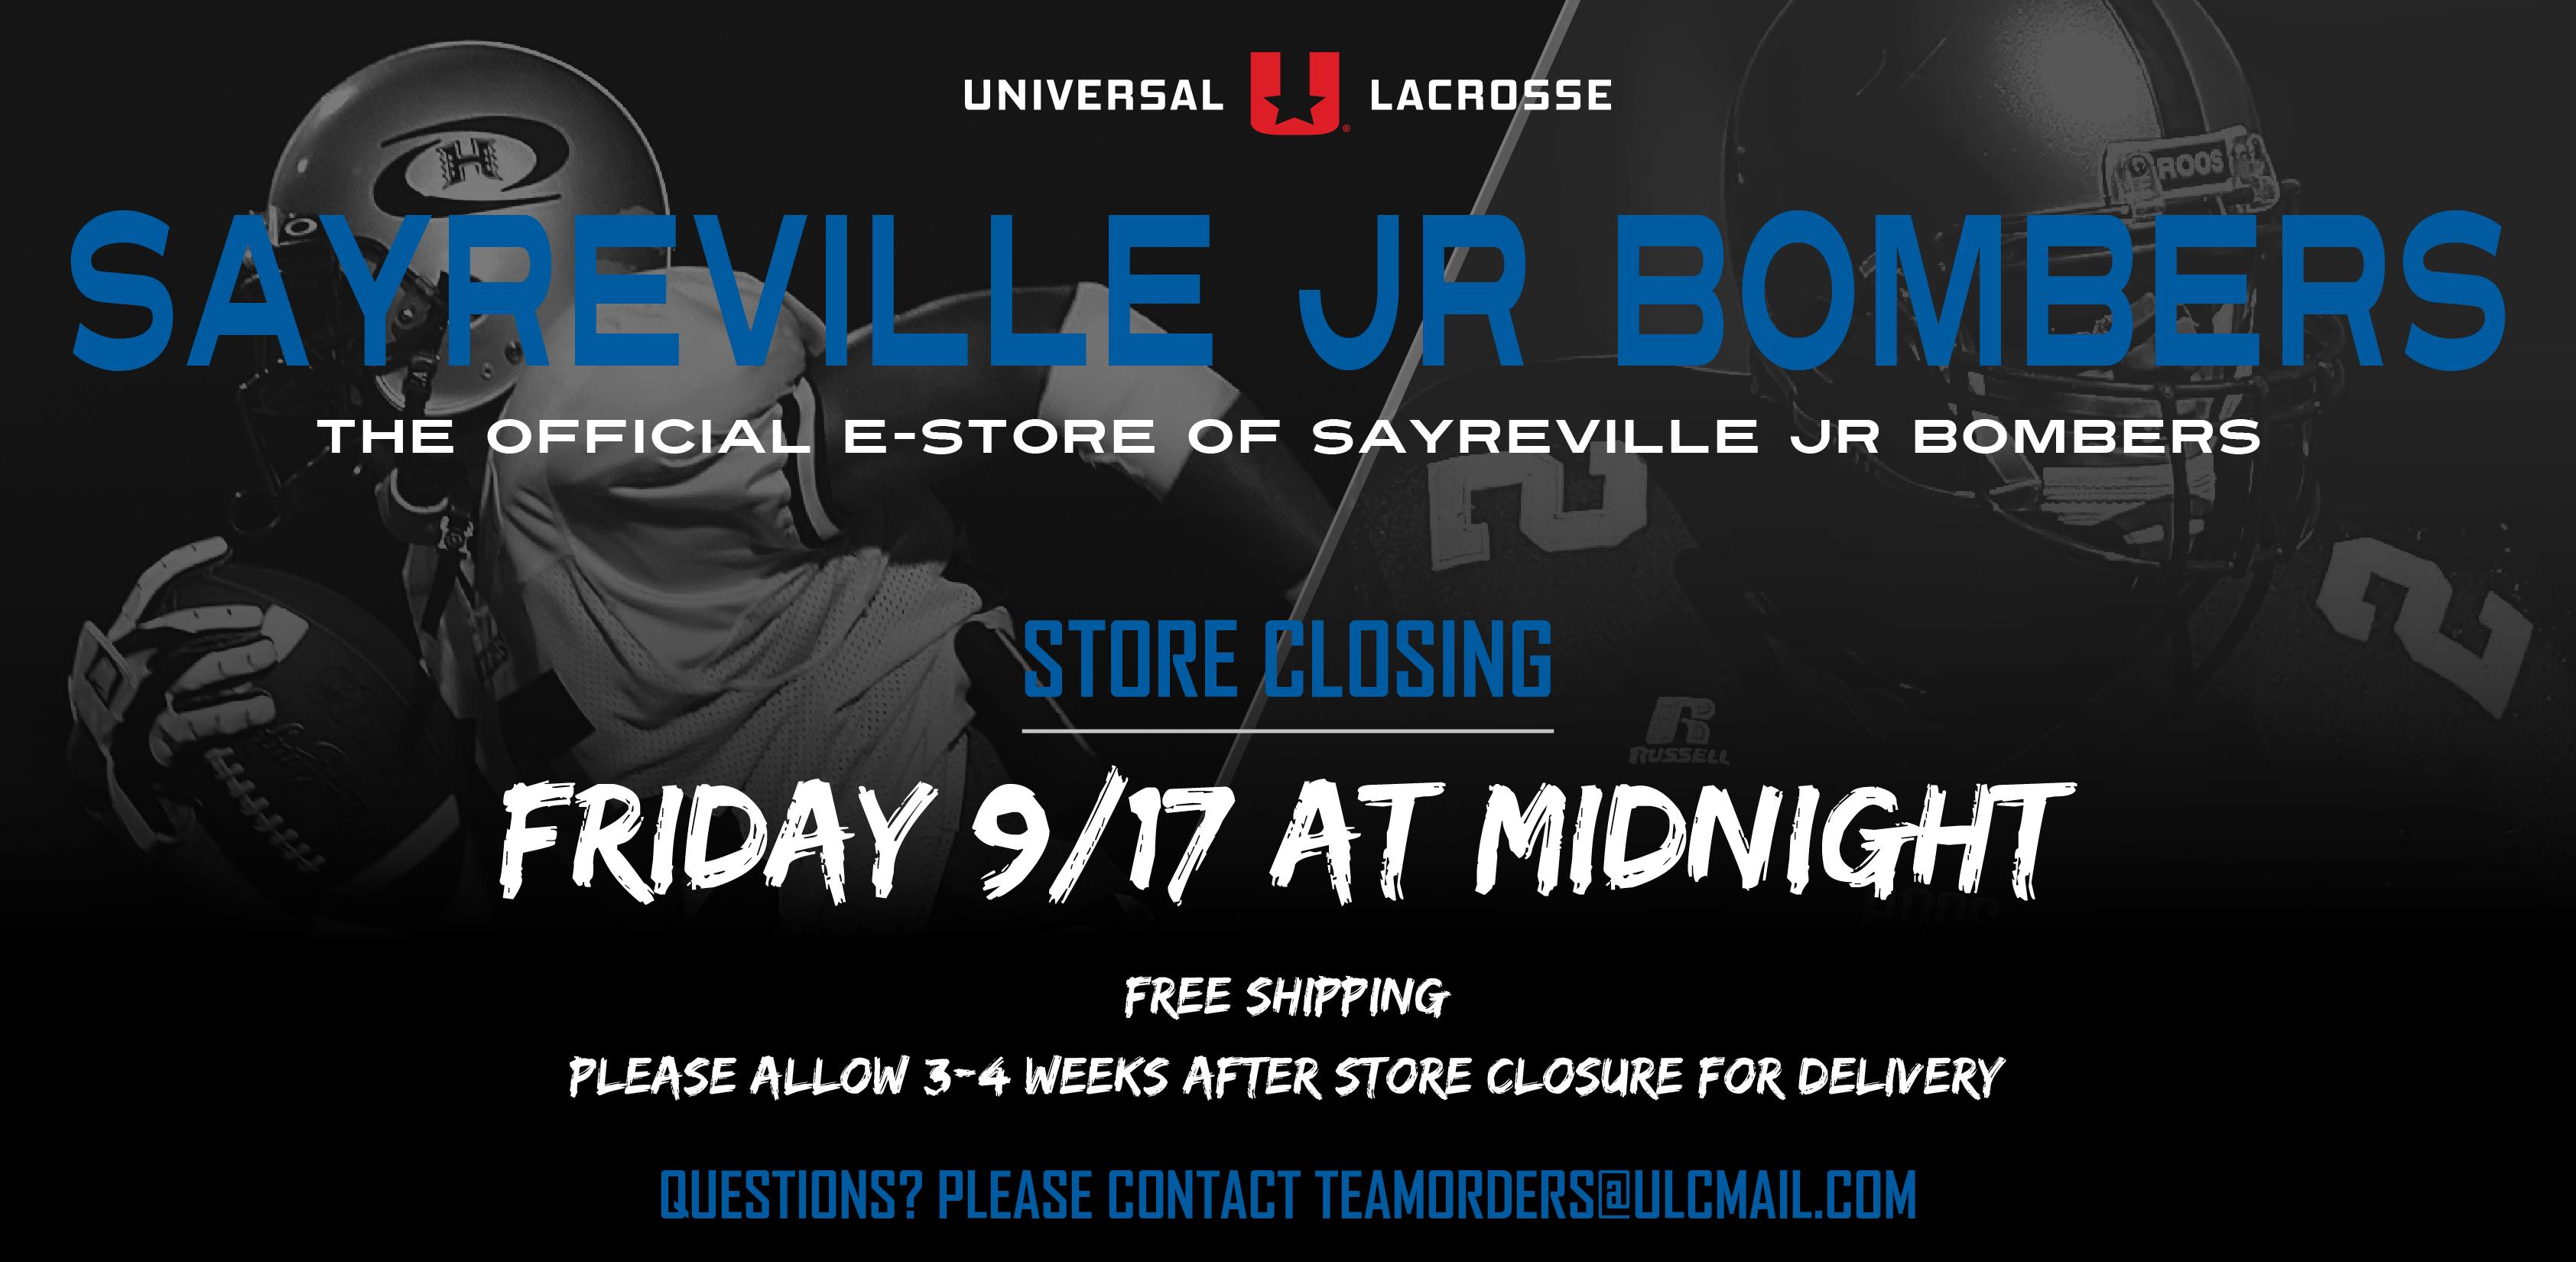 Sayreville Jr Bombers